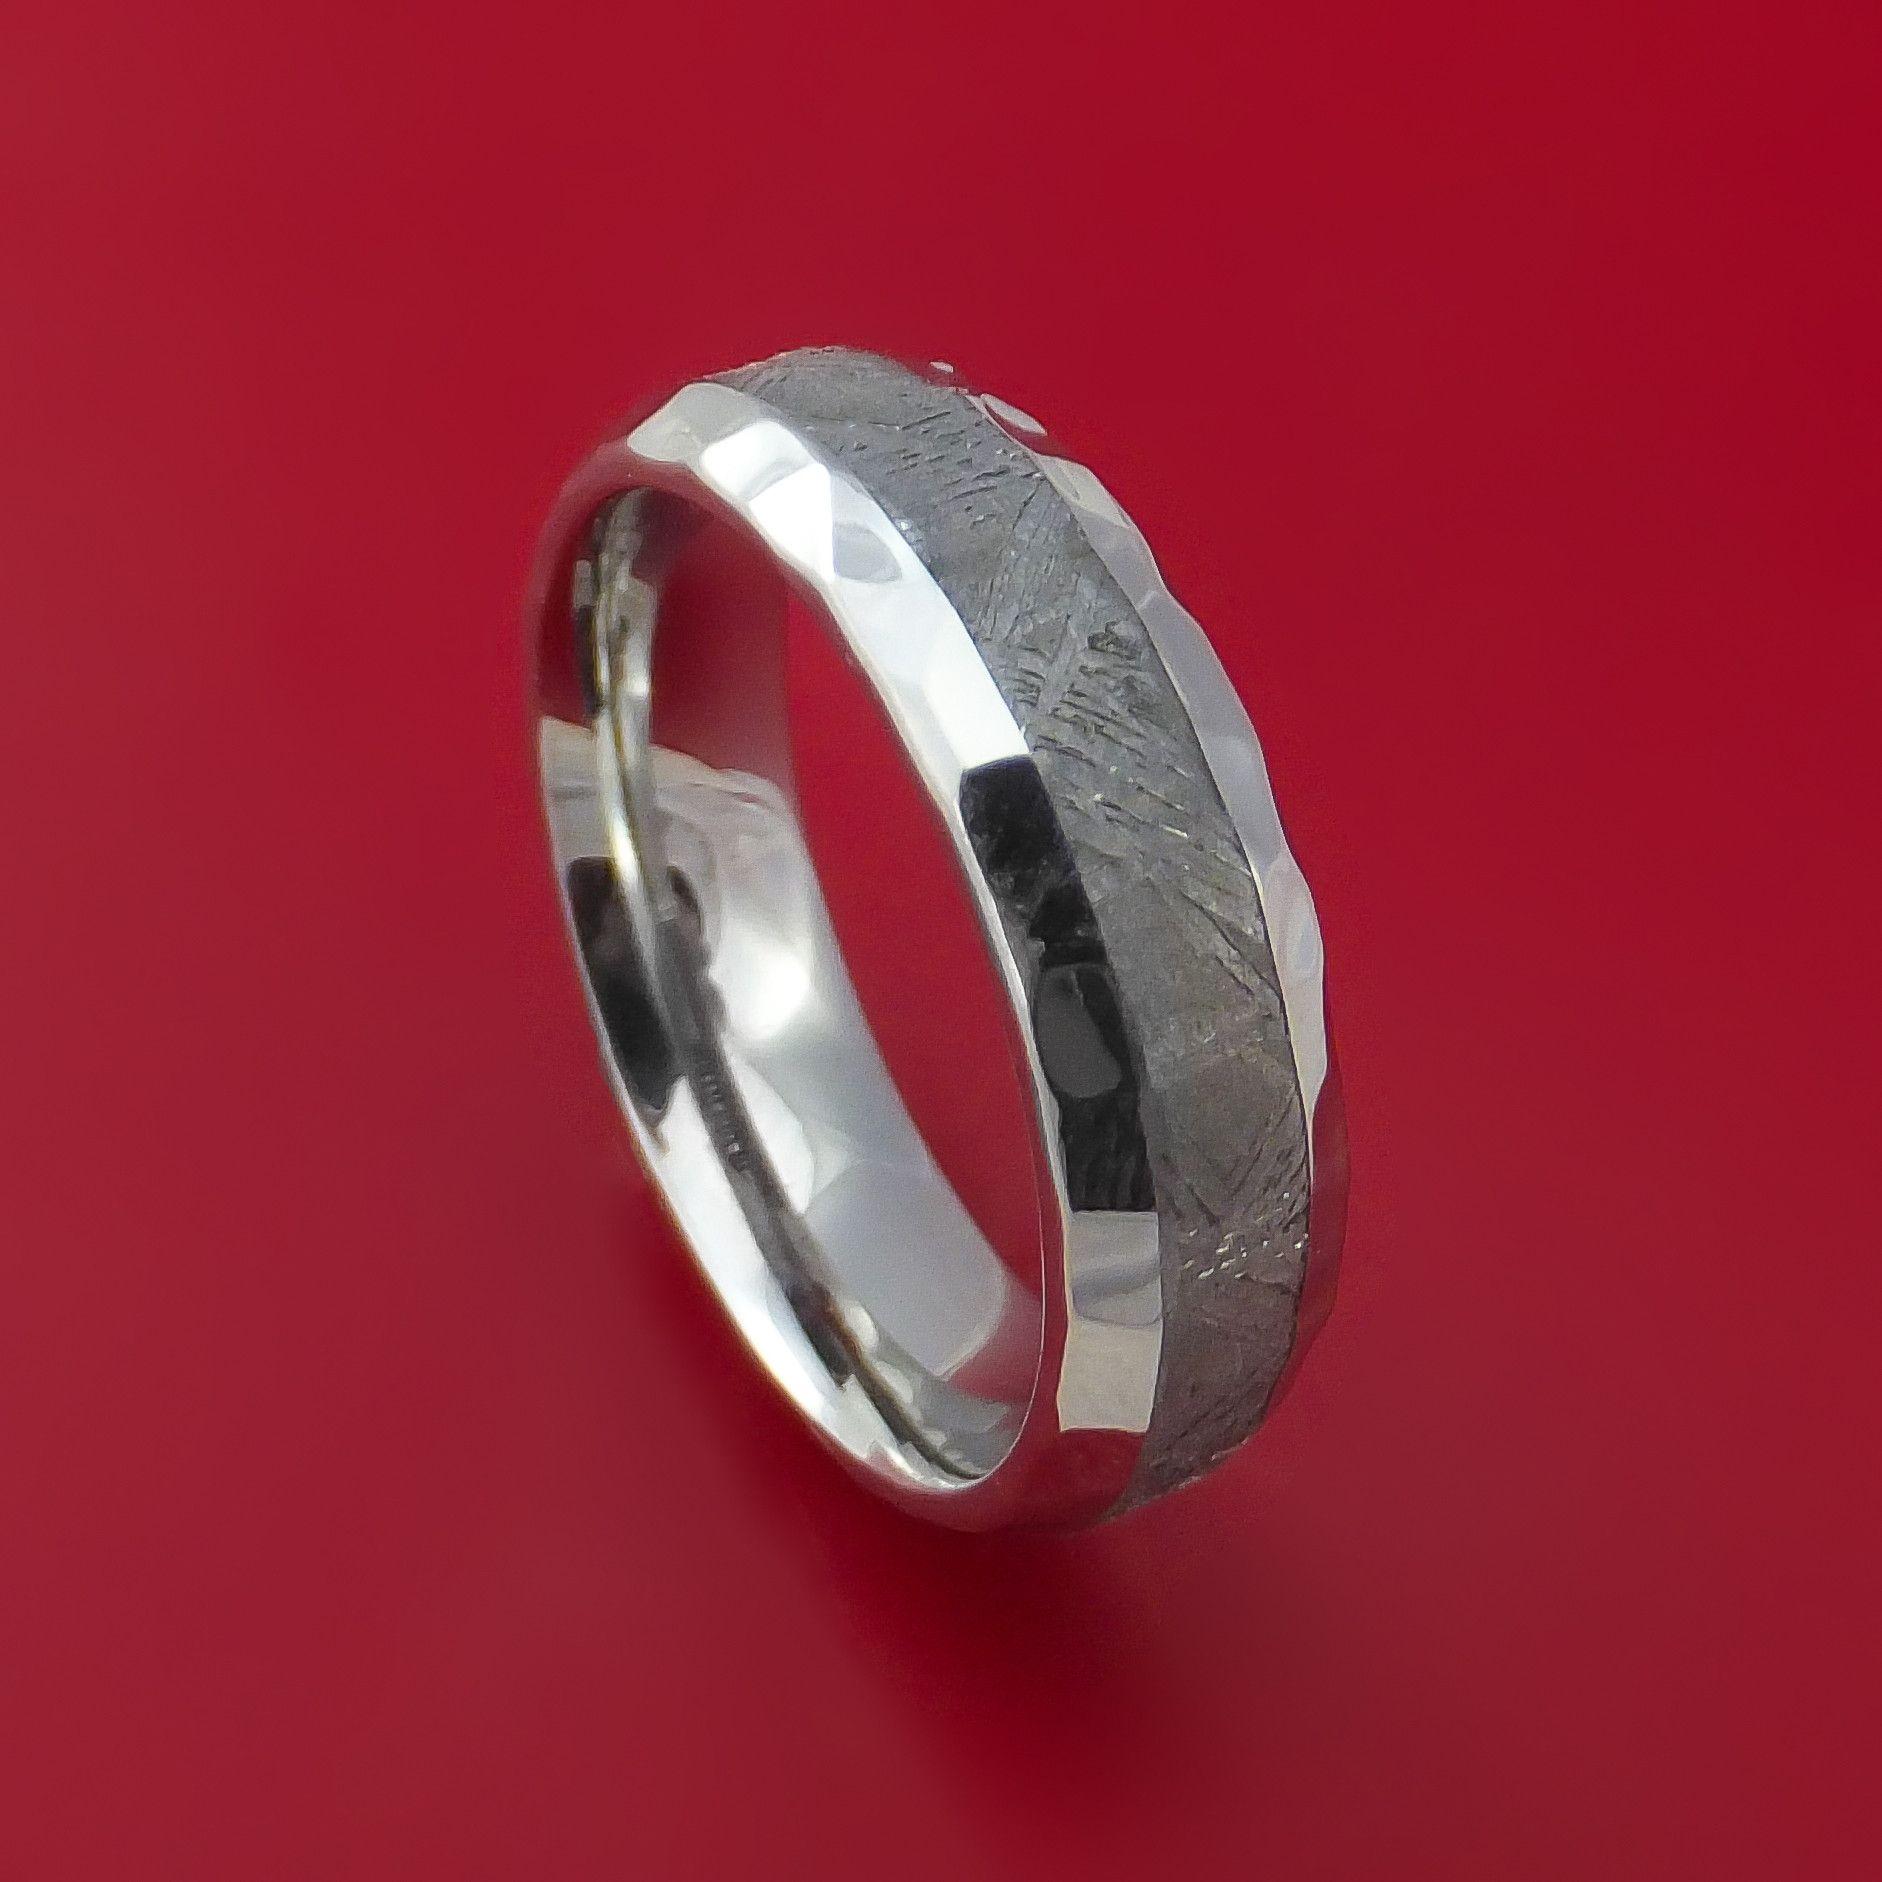 Cobalt Chrome Ring with Gibeon Meteorite Inlay Custom Made